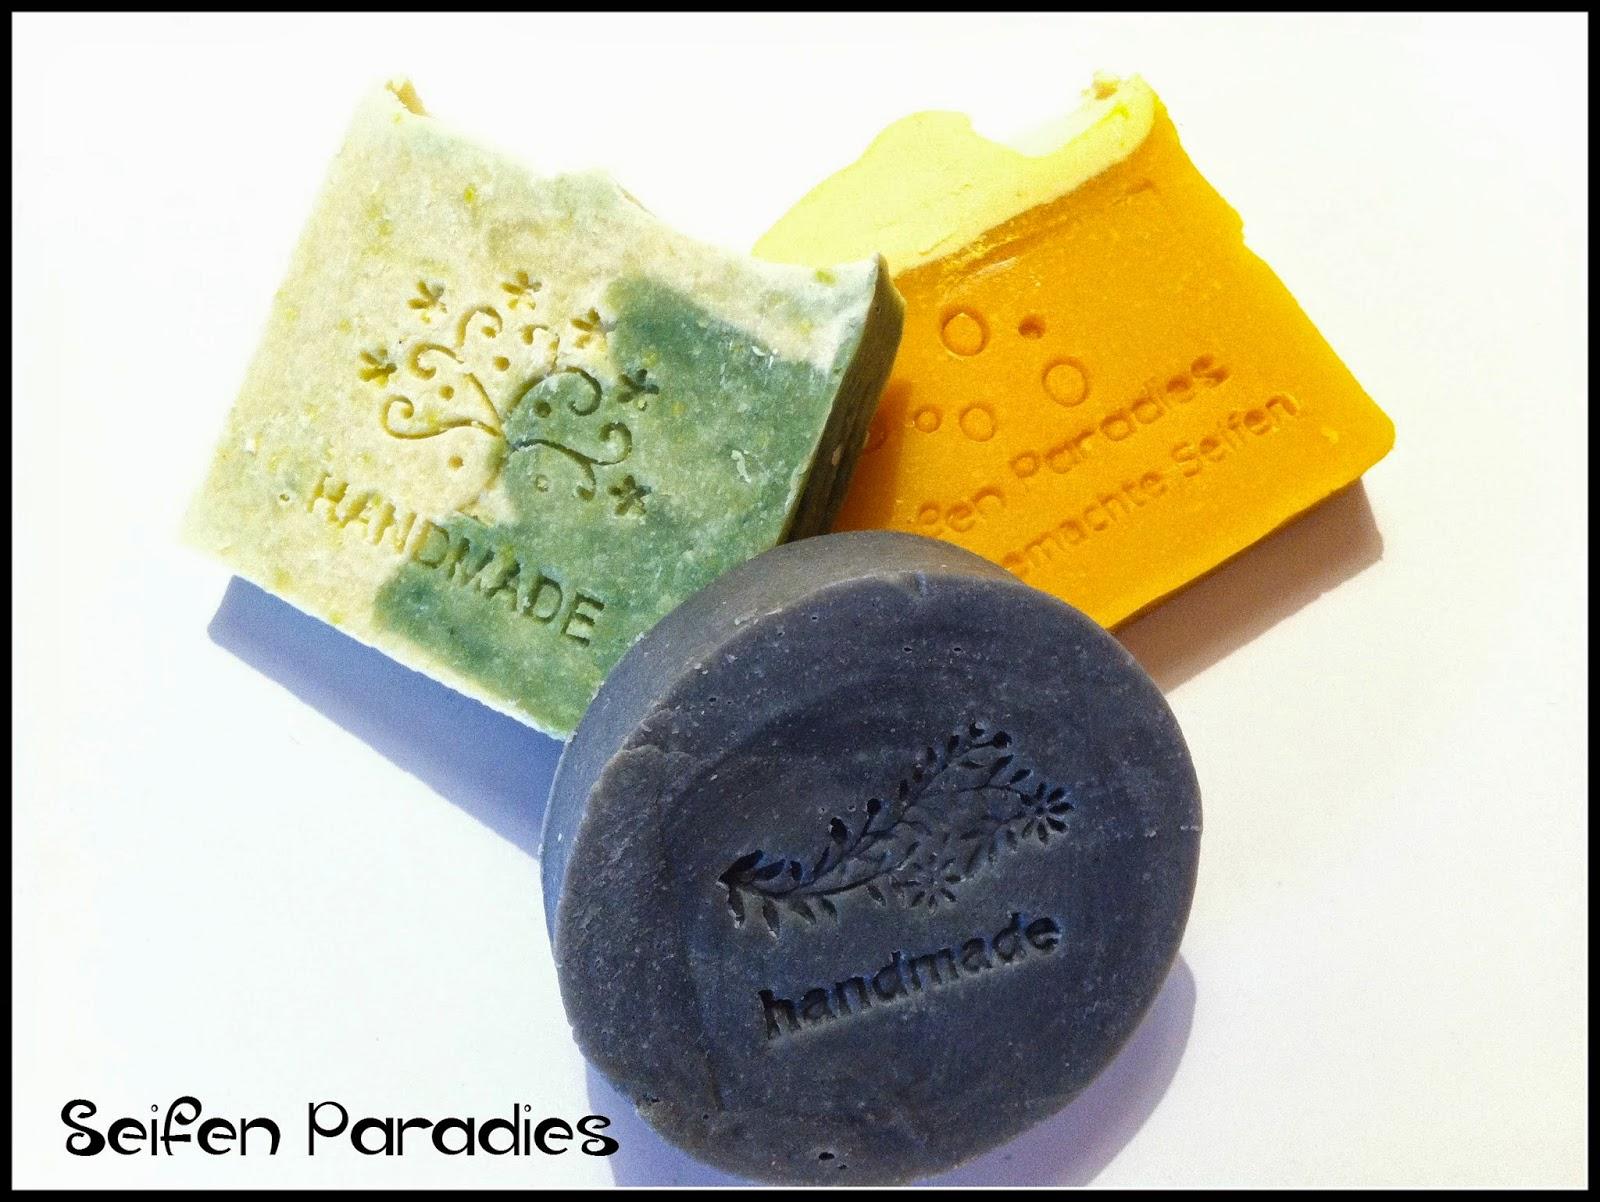 http://www.seifen-paradies.ch/p/seifen-soaps.html